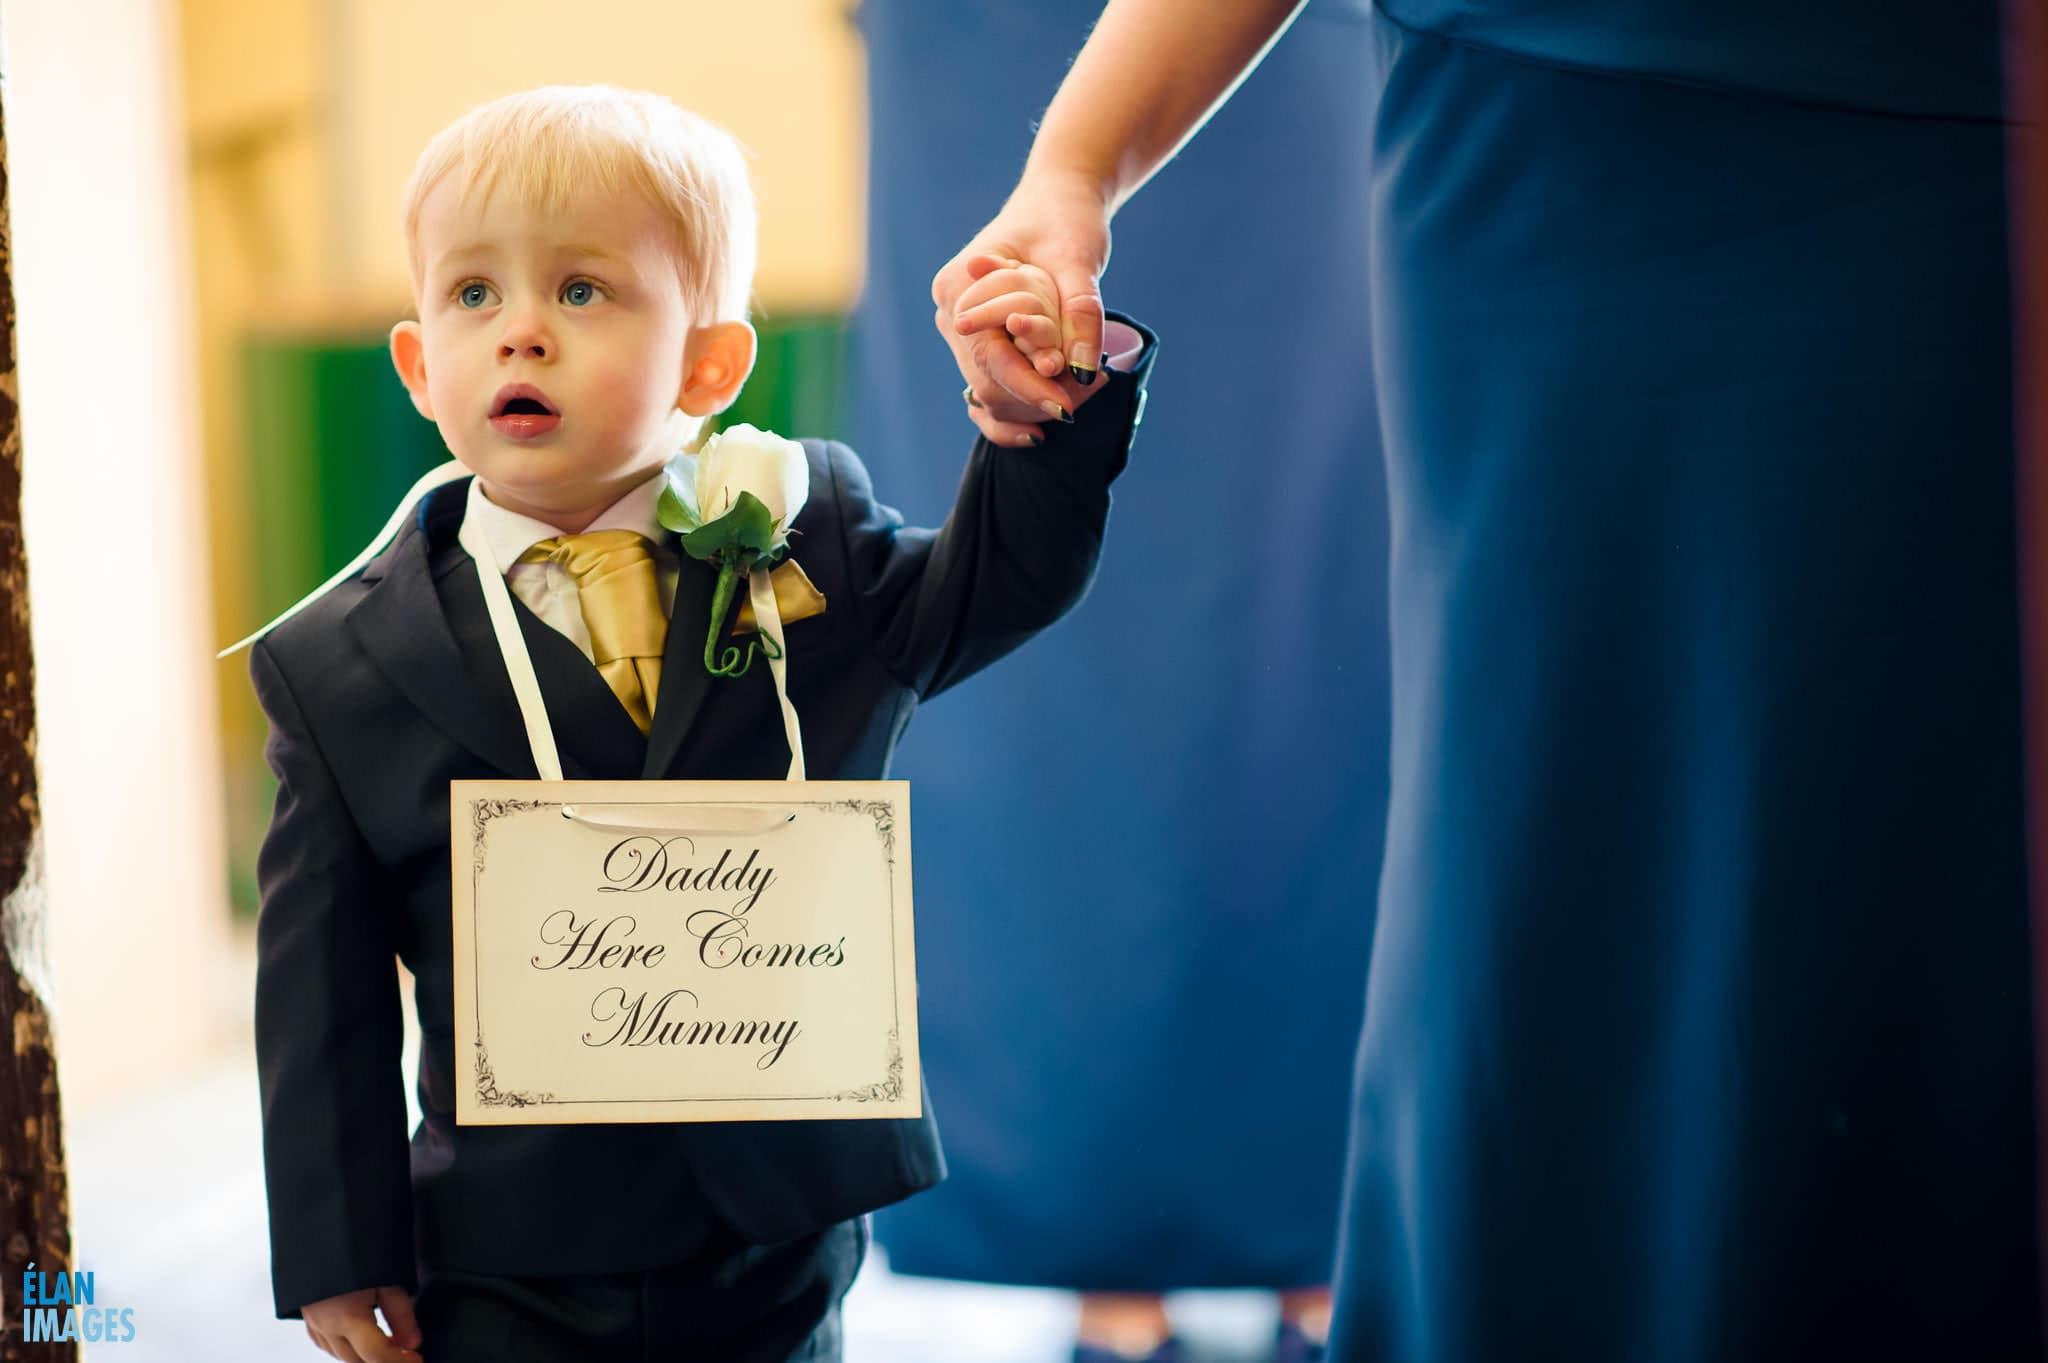 Wedding at leigh park hotel -051